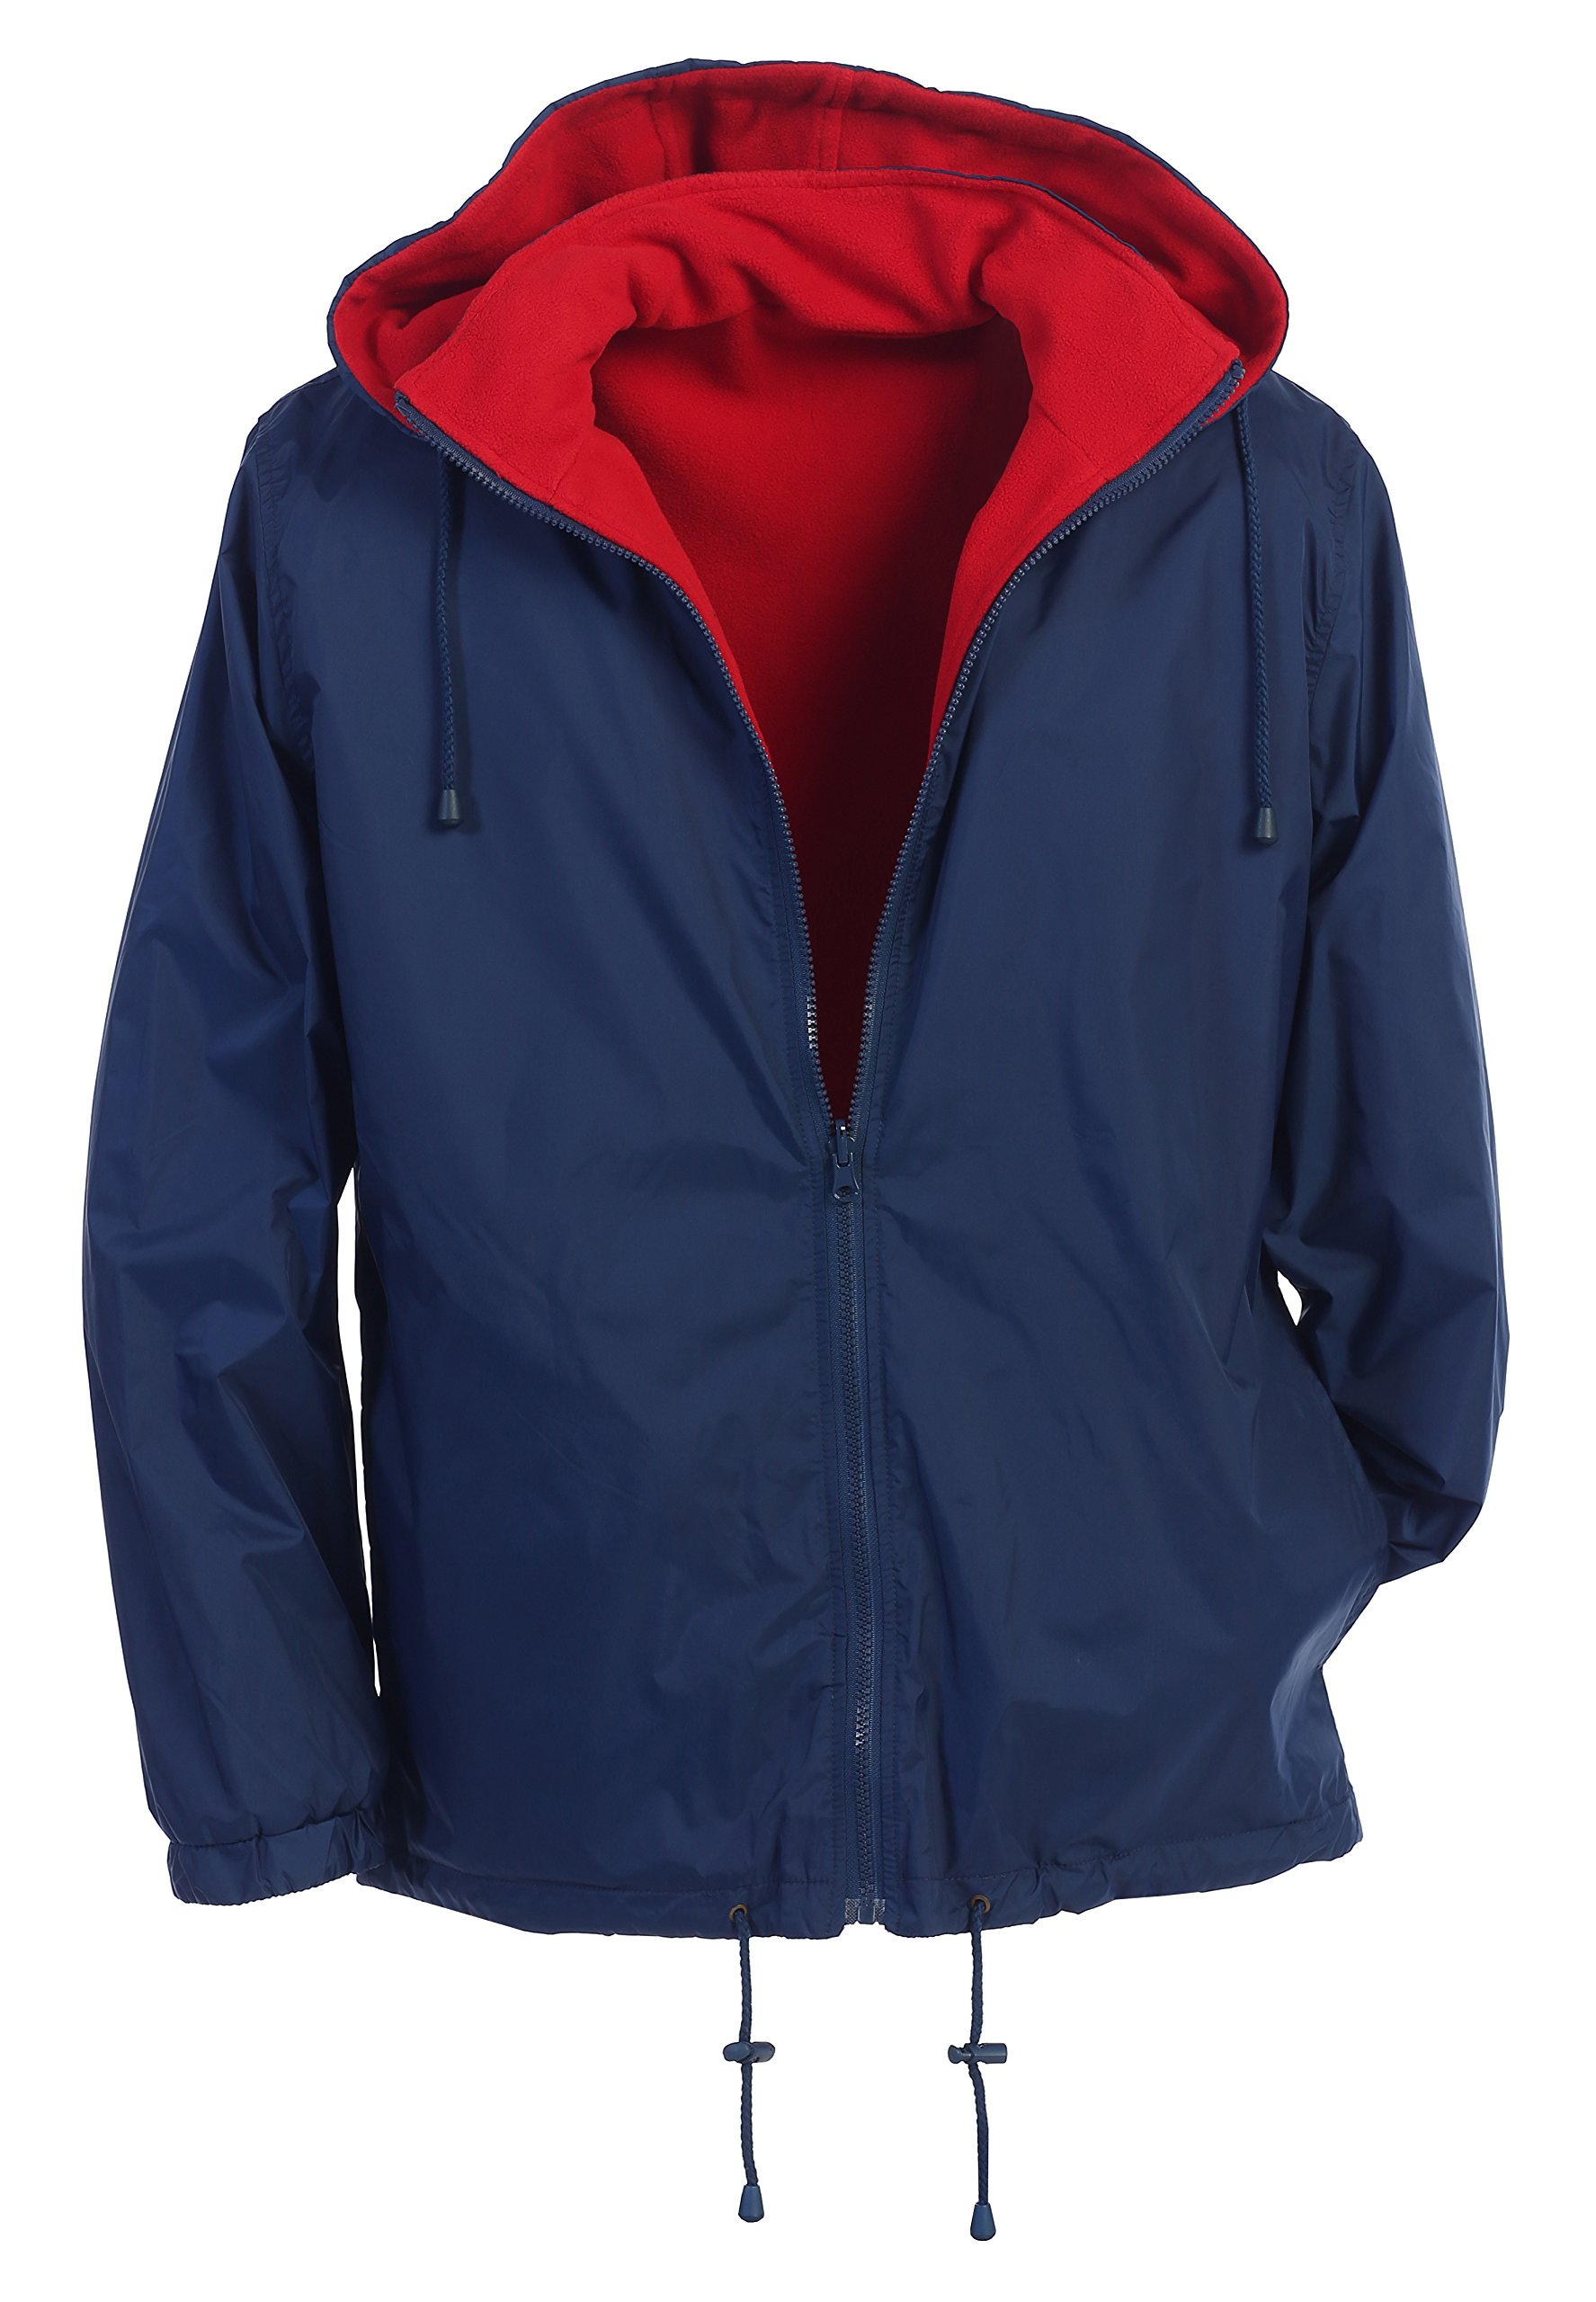 Gioberti Men's Reversible Rain Jacket with Polar Fleece Lining, Navy/Red, XXL